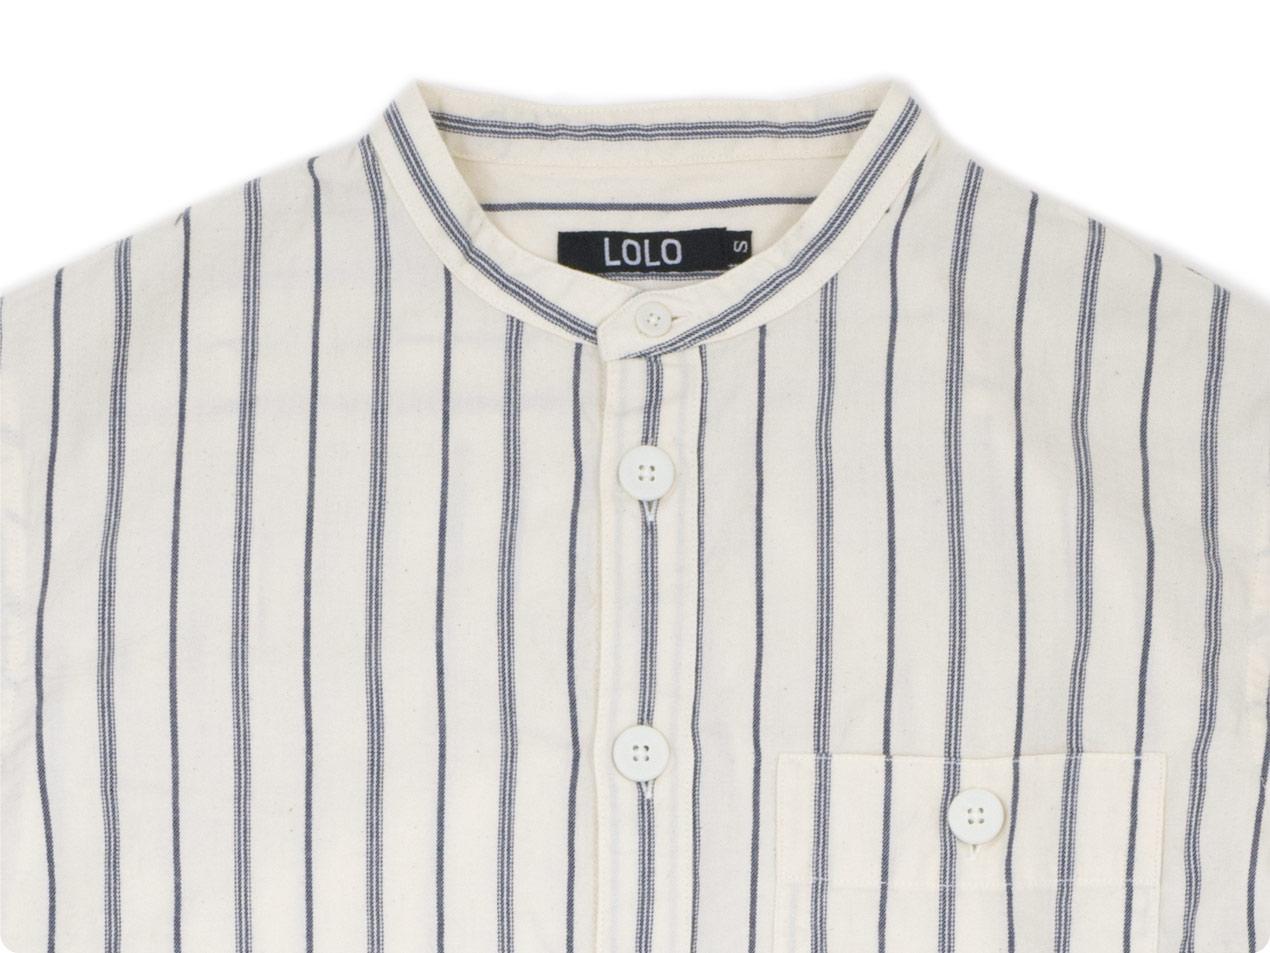 LOLO スタンドカラーストライプシャツ